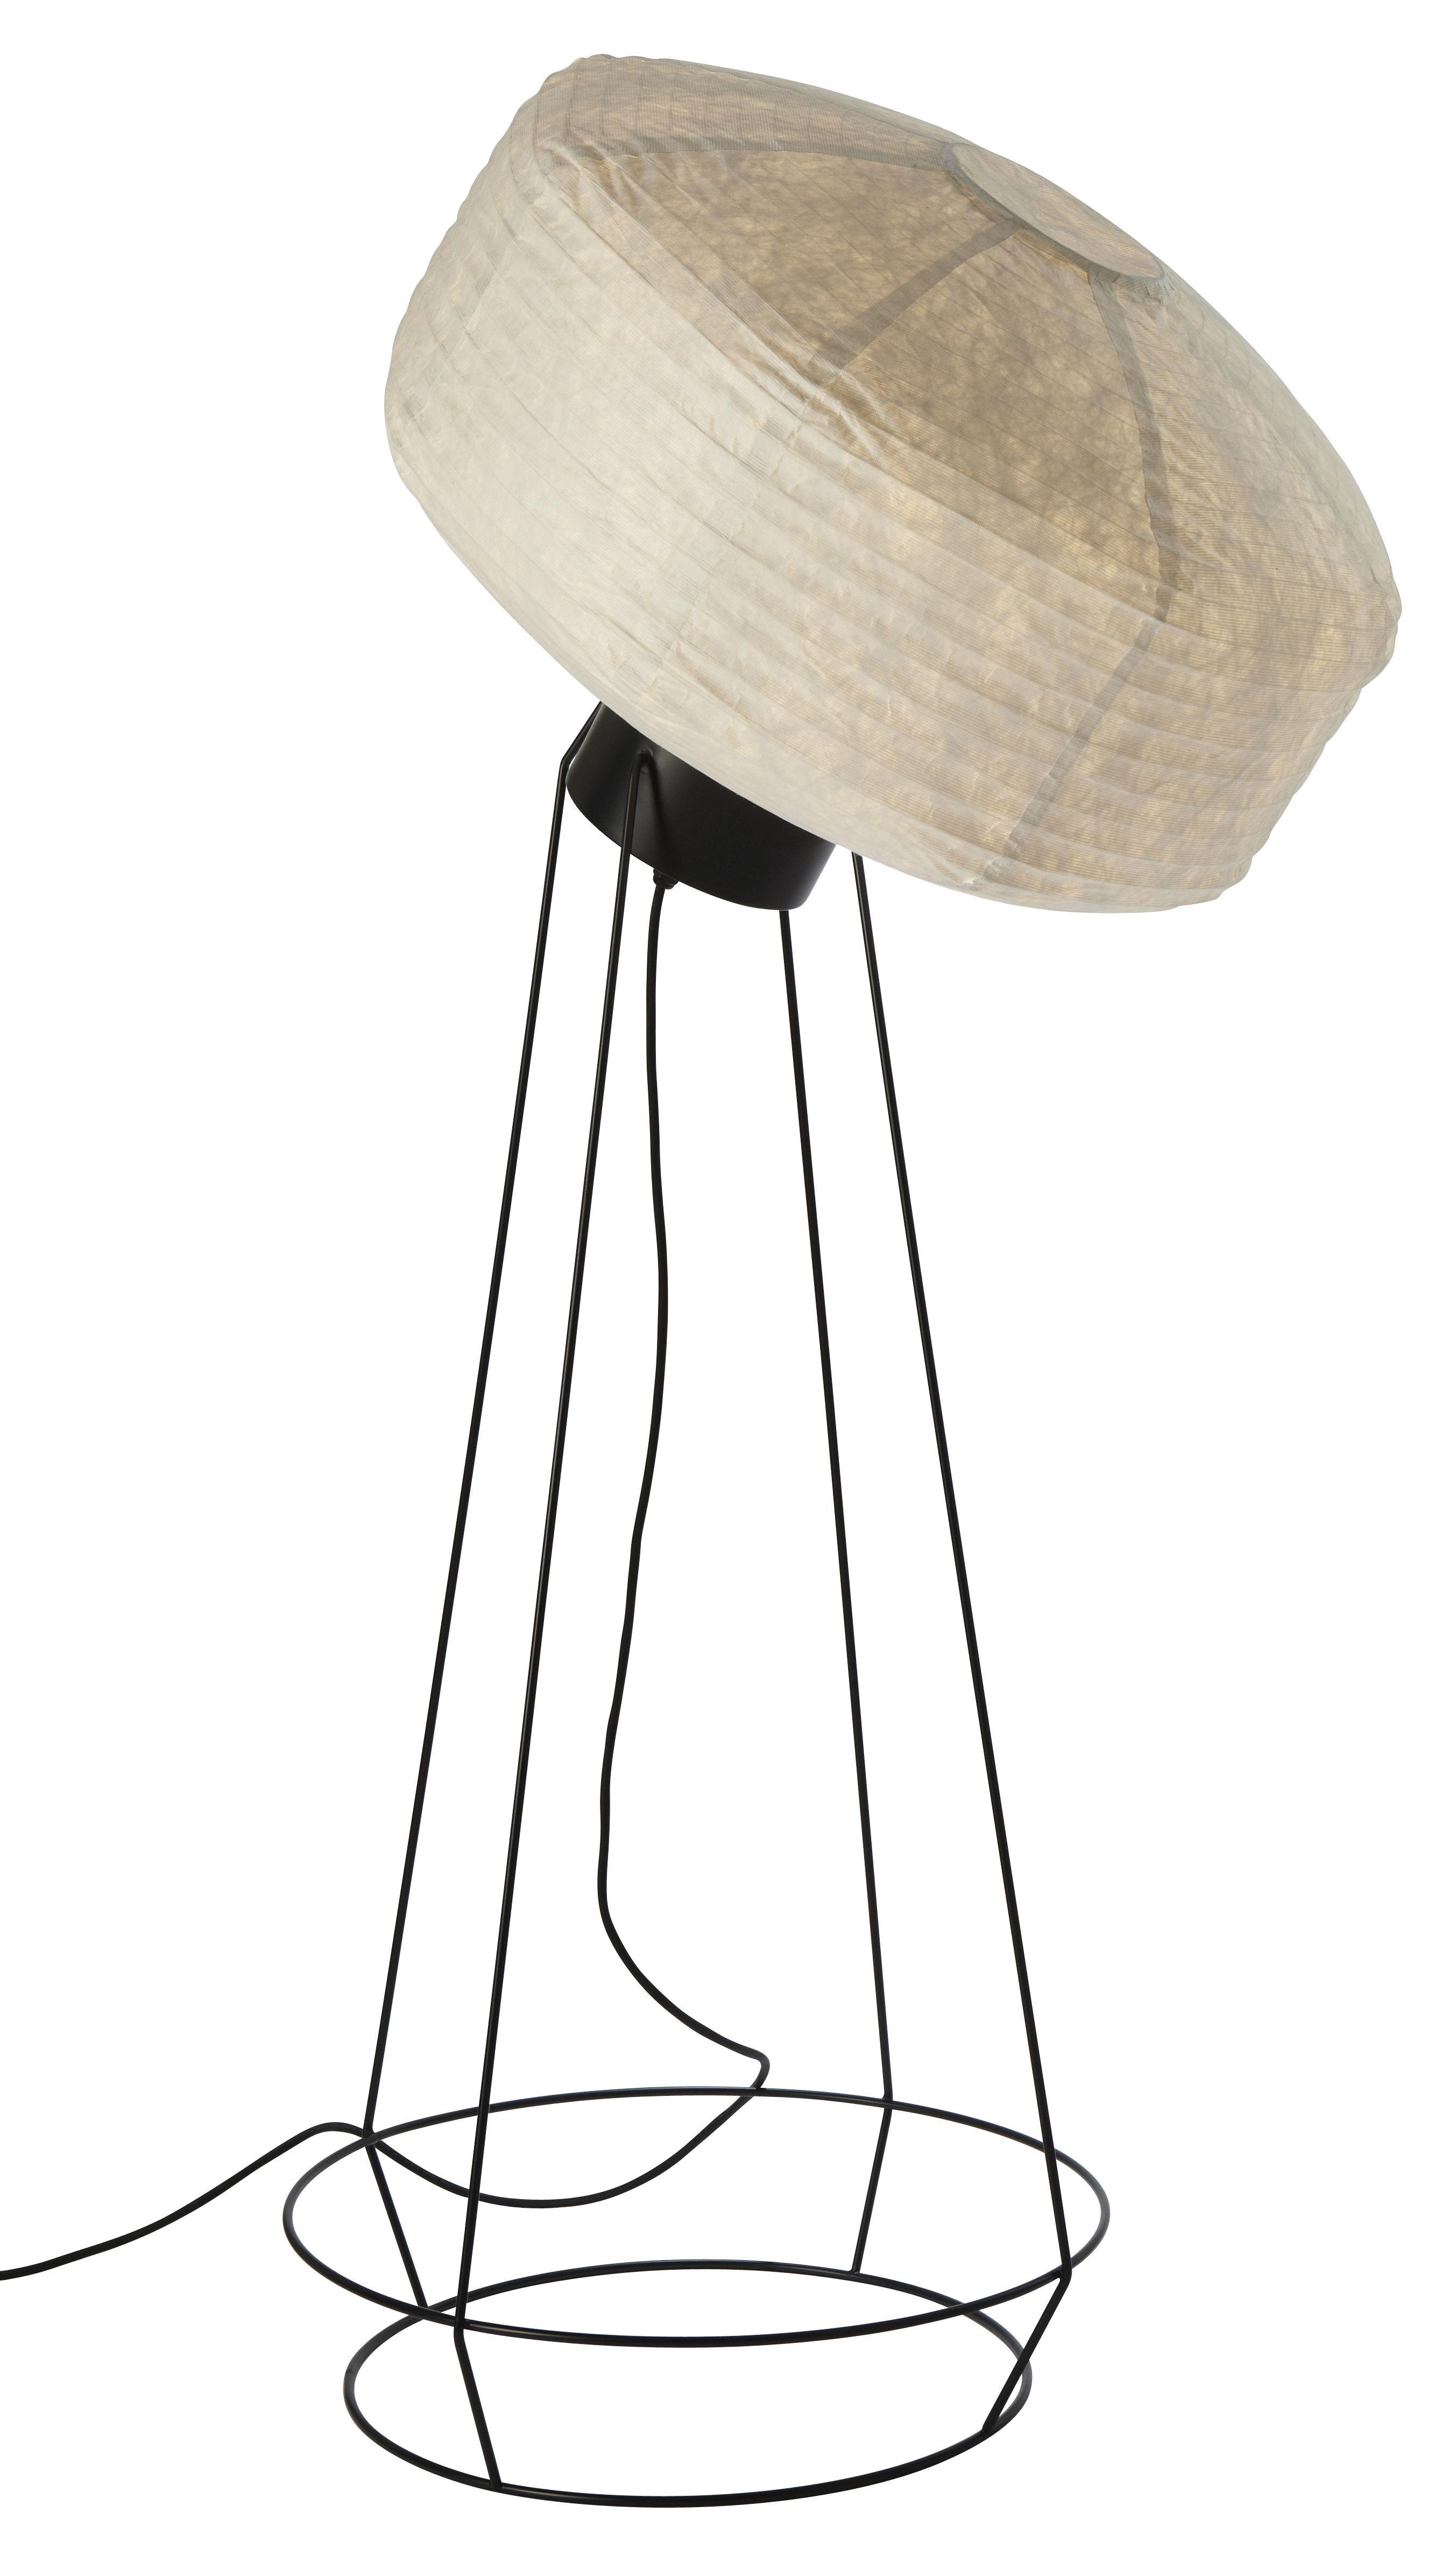 Lighting - Floor lamps - Cage Floor lamp - H 125 cm by Forestier - Black - Lacquered metal, Tyvek